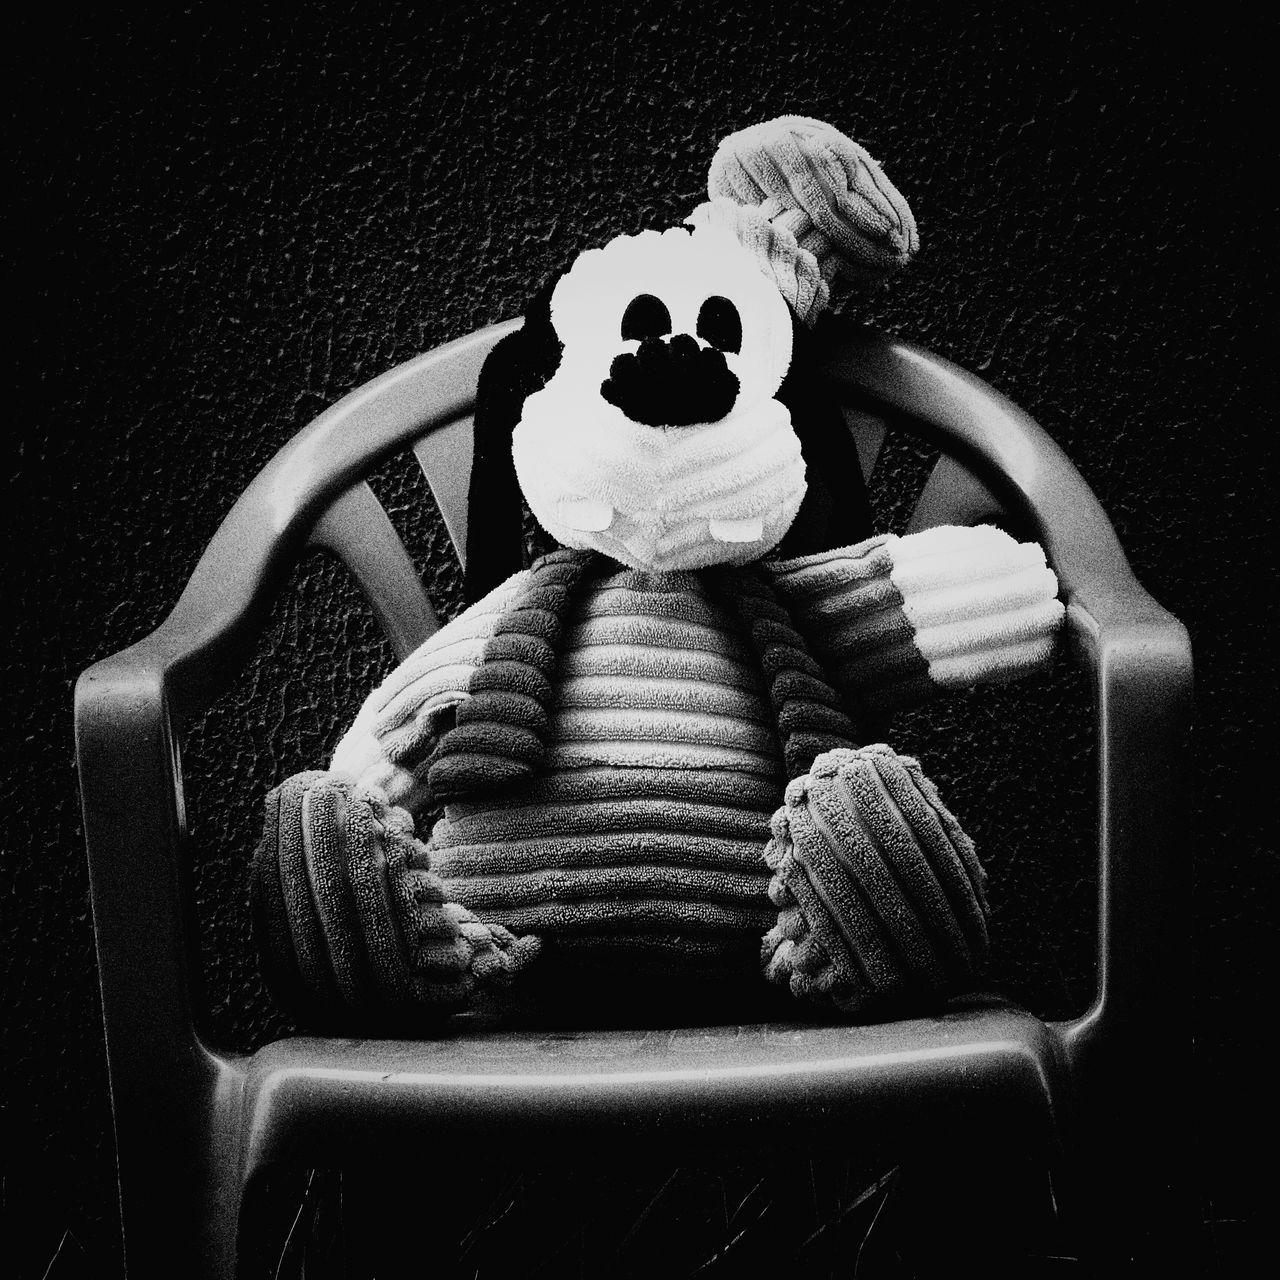 Praticando objetos. Still Black And White Innocence Outdoors Outdoors Modografiabrasil Modografiavisual Modografia Omegafly Toys Brinquedos